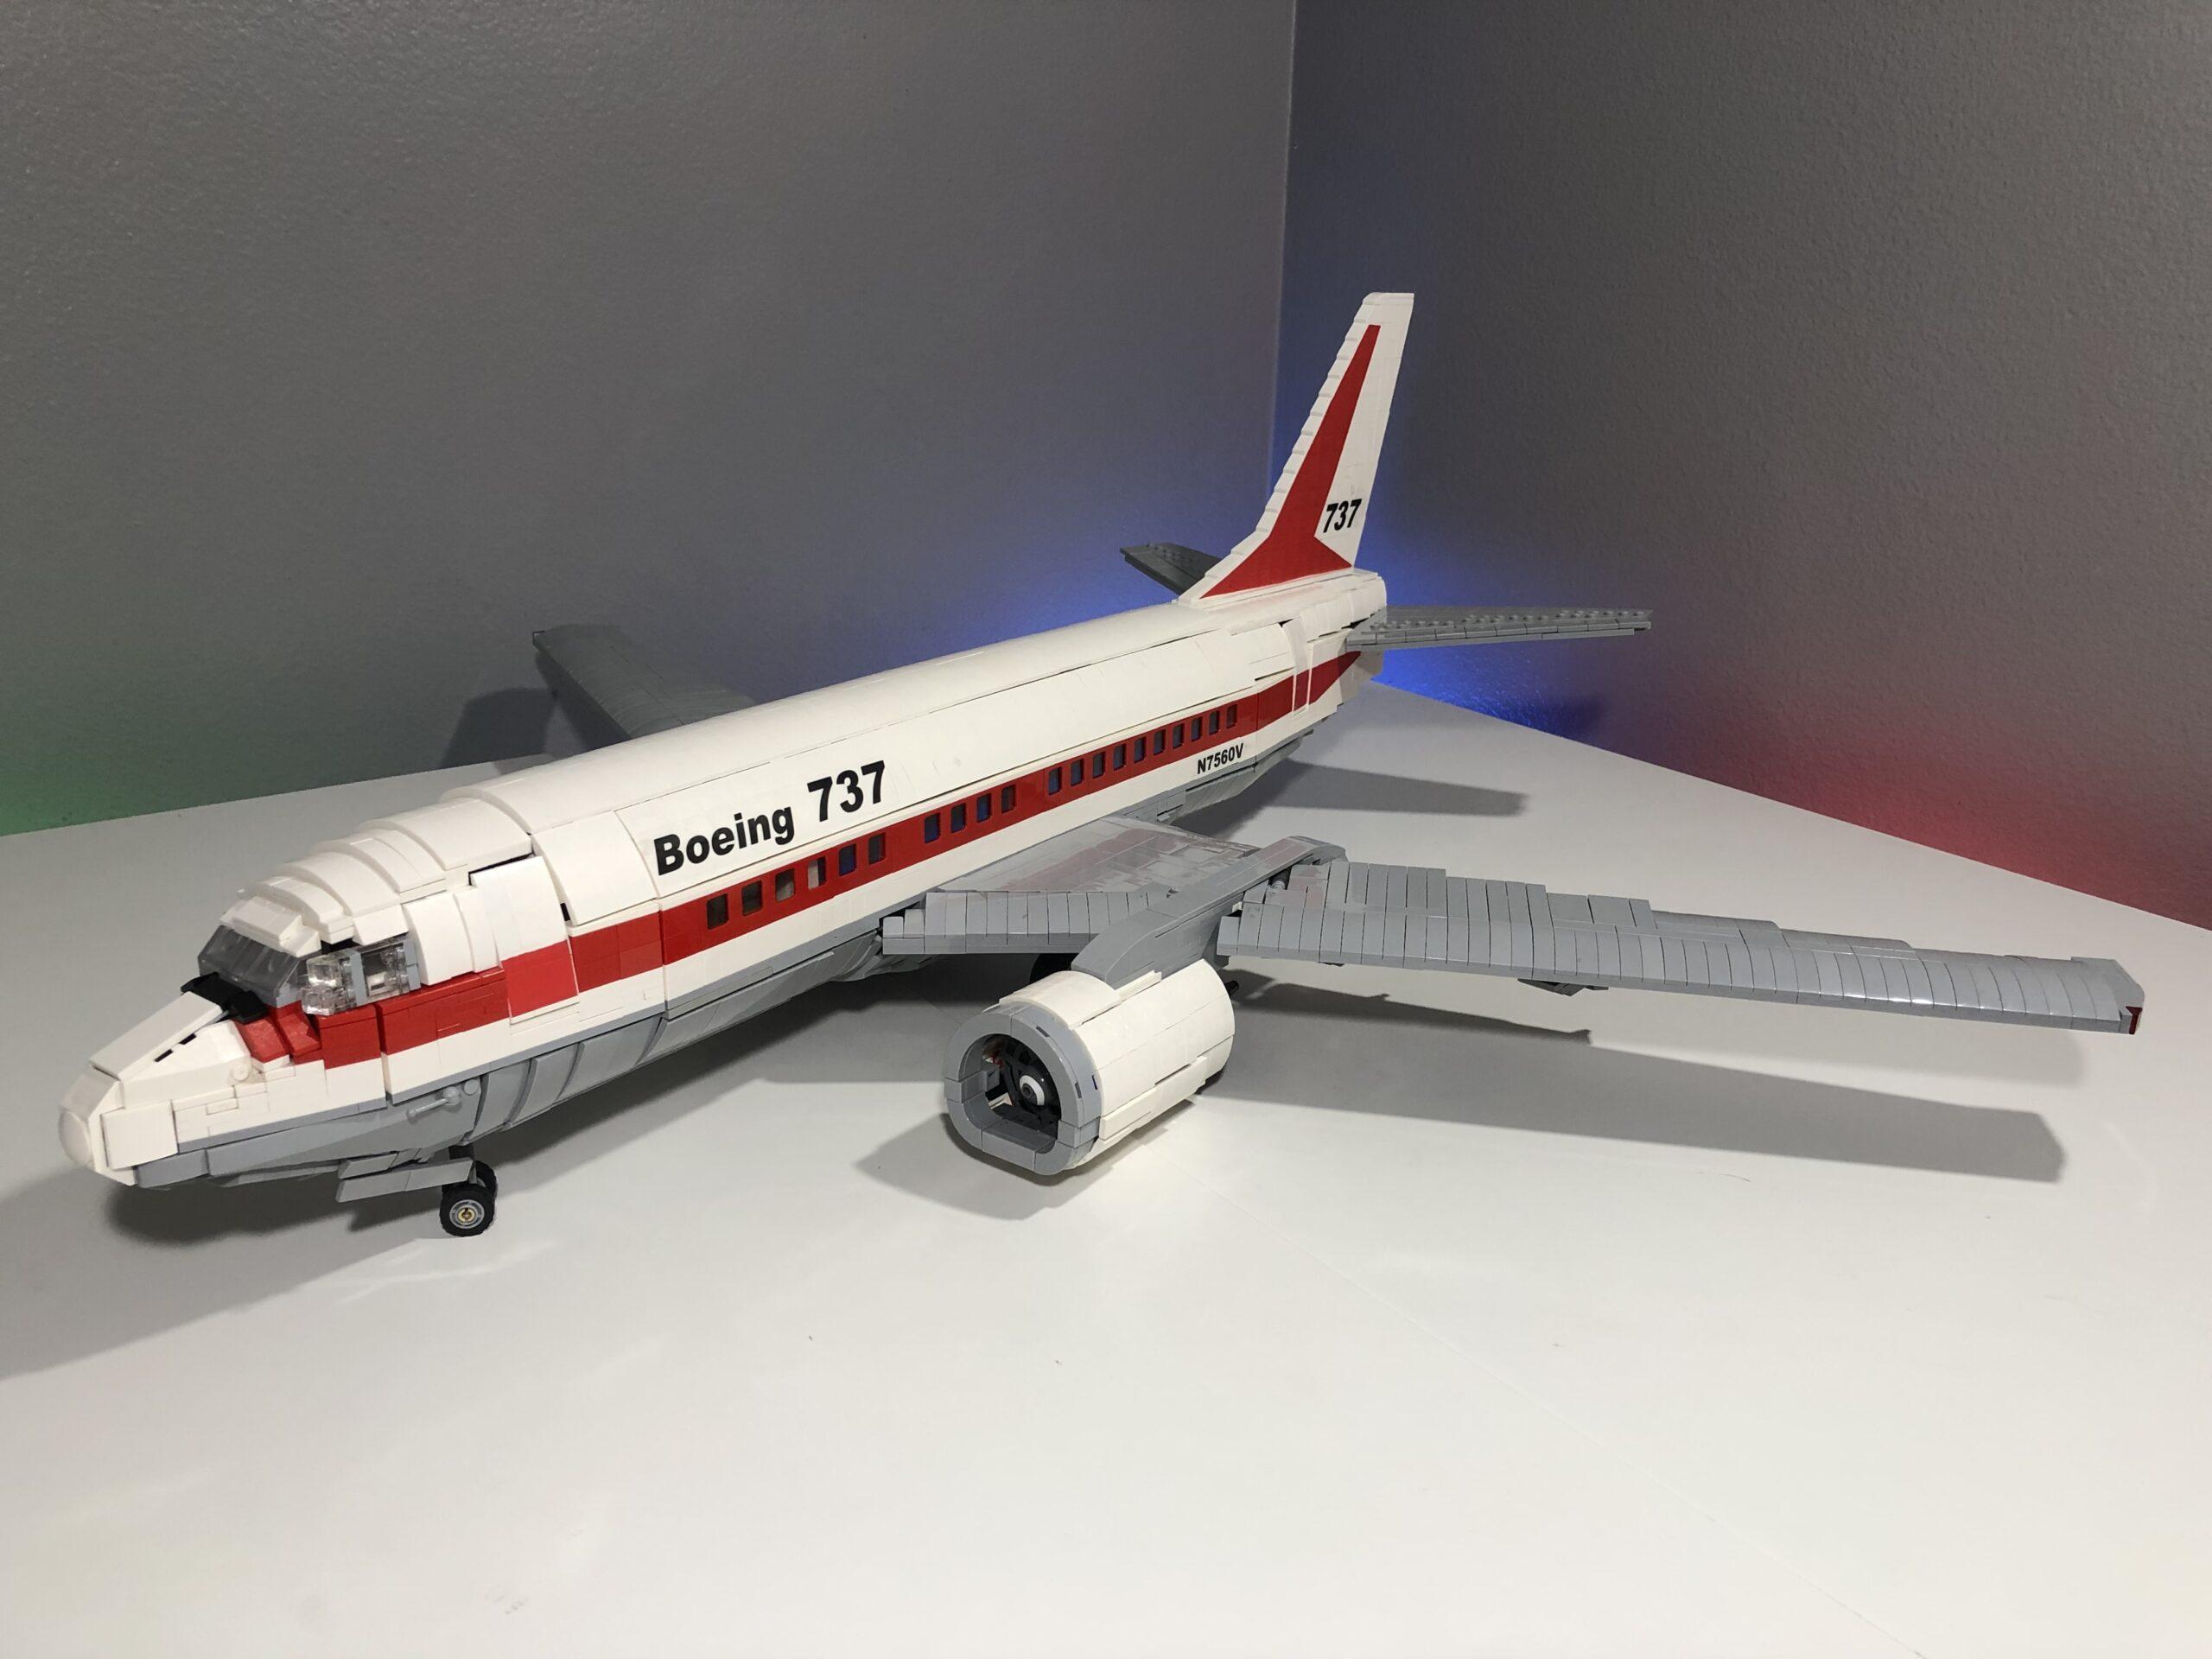 LEGO Ideas Boeing 737 Passenger Plane BigPlanes-Customs aus Bricks